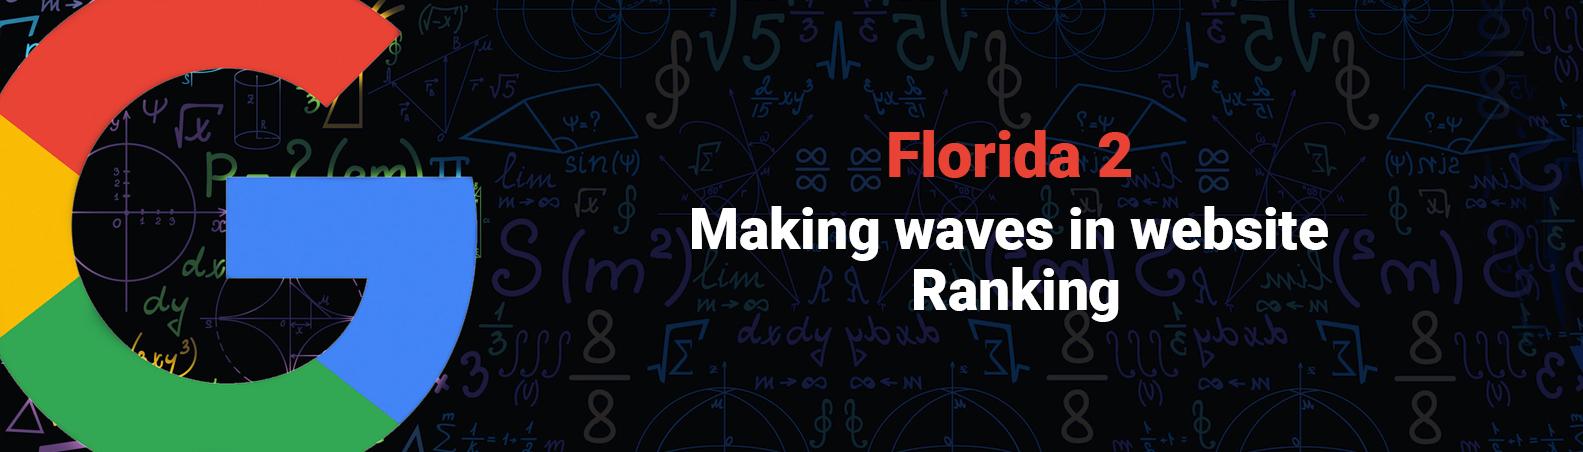 Florida 2_